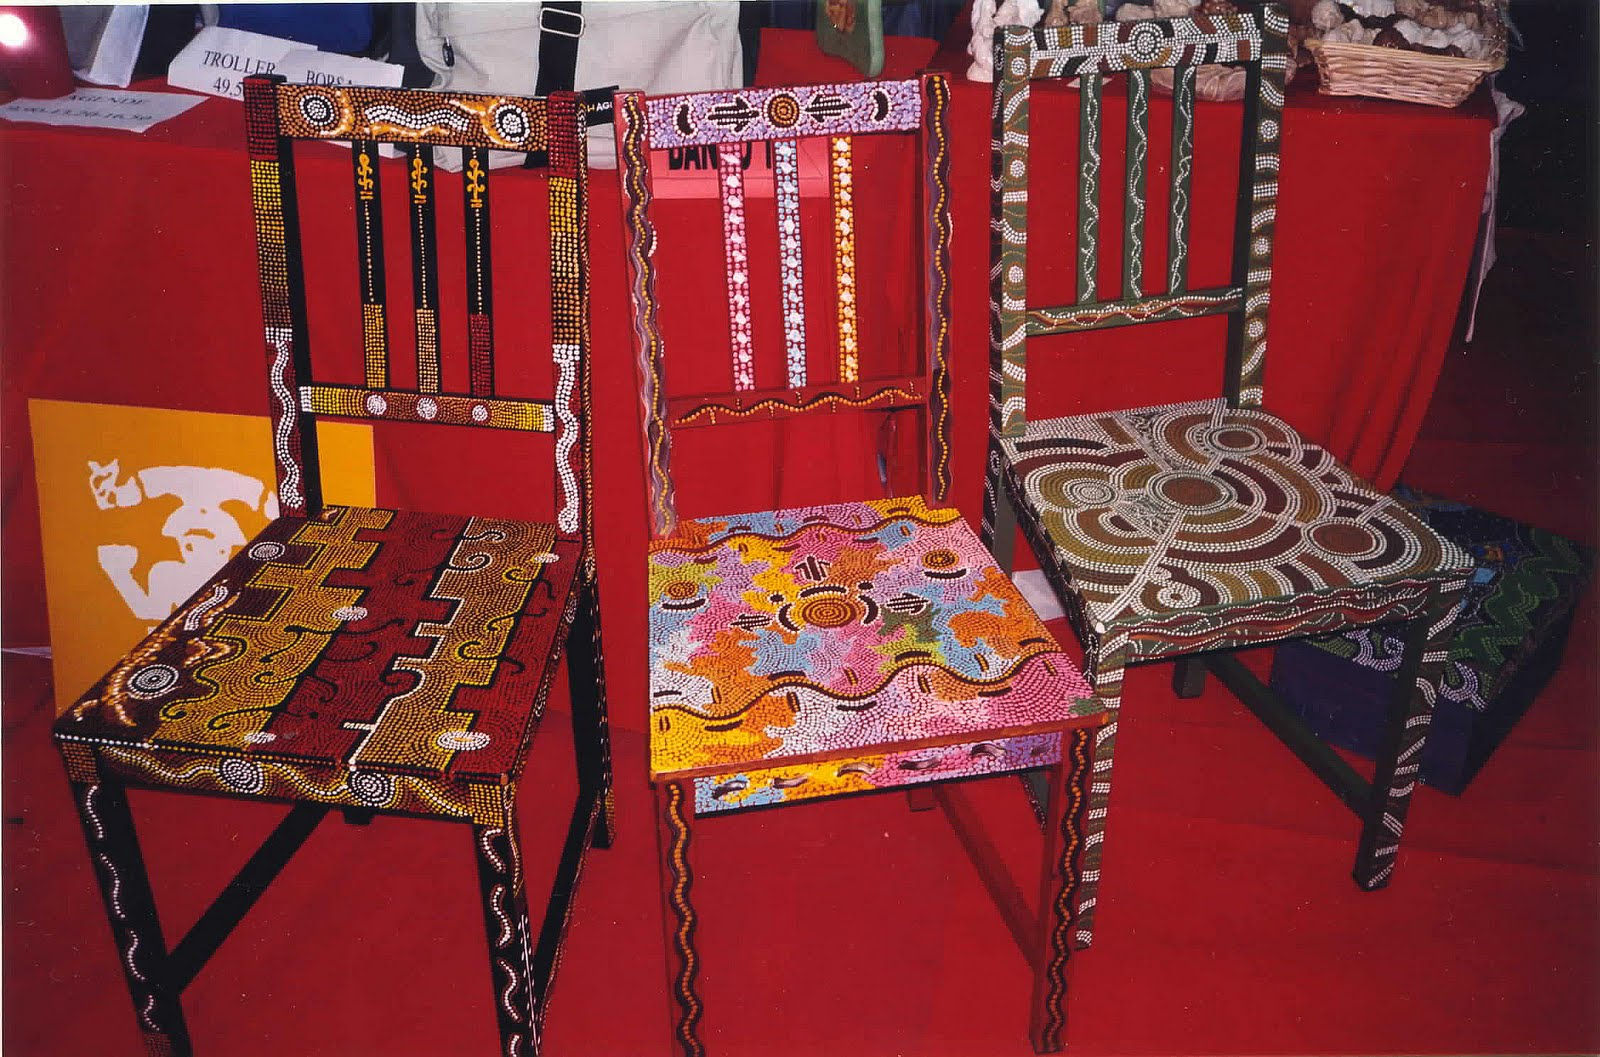 Sedie decorate da artisti tavoli in pietra lavica for Sedie decorate da artisti